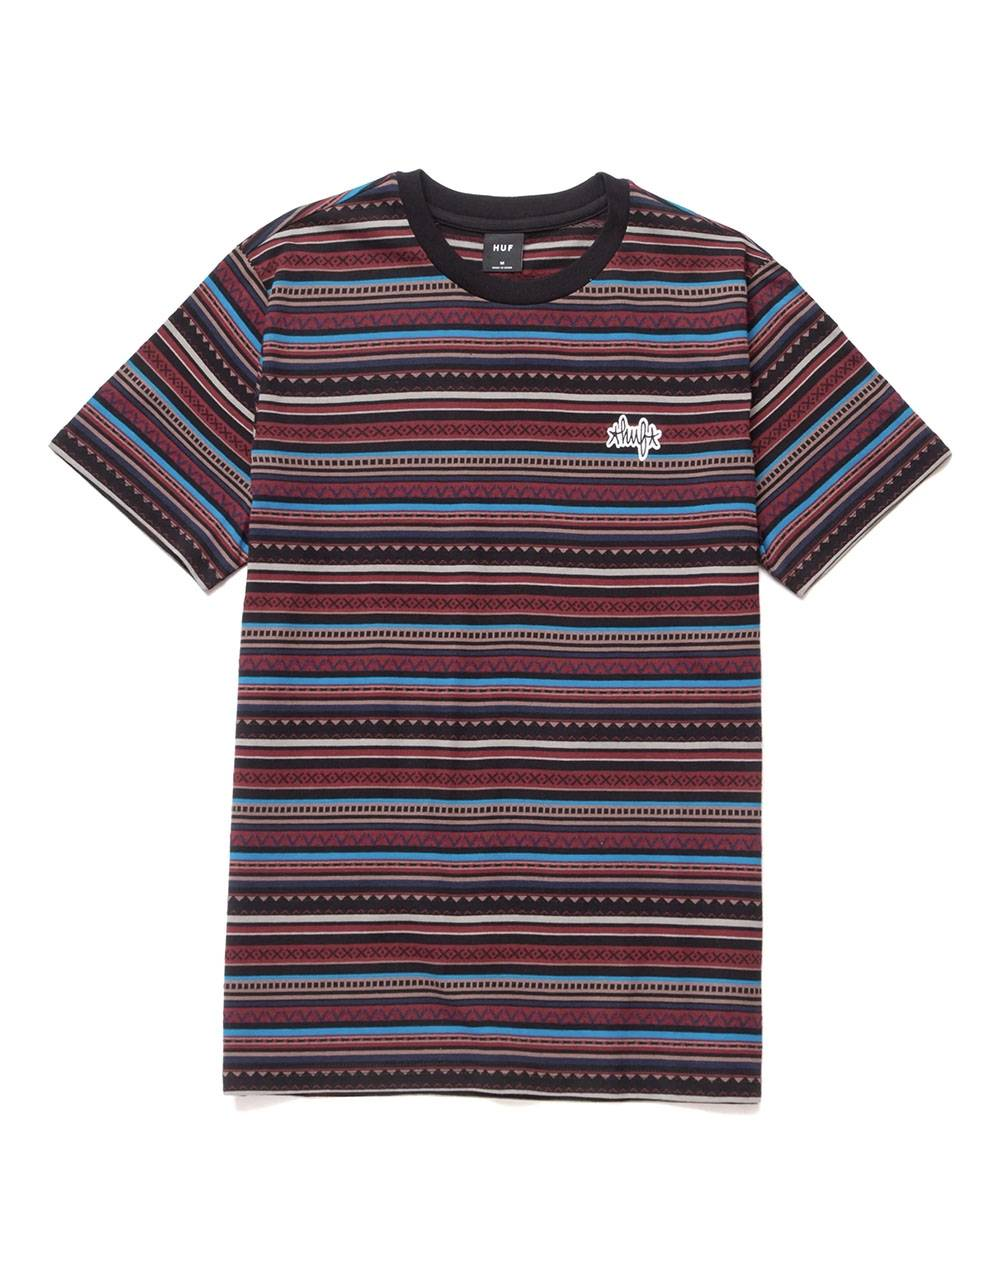 Huf Topanga knit top tee - navy blazer Huf T-shirt 65,00€